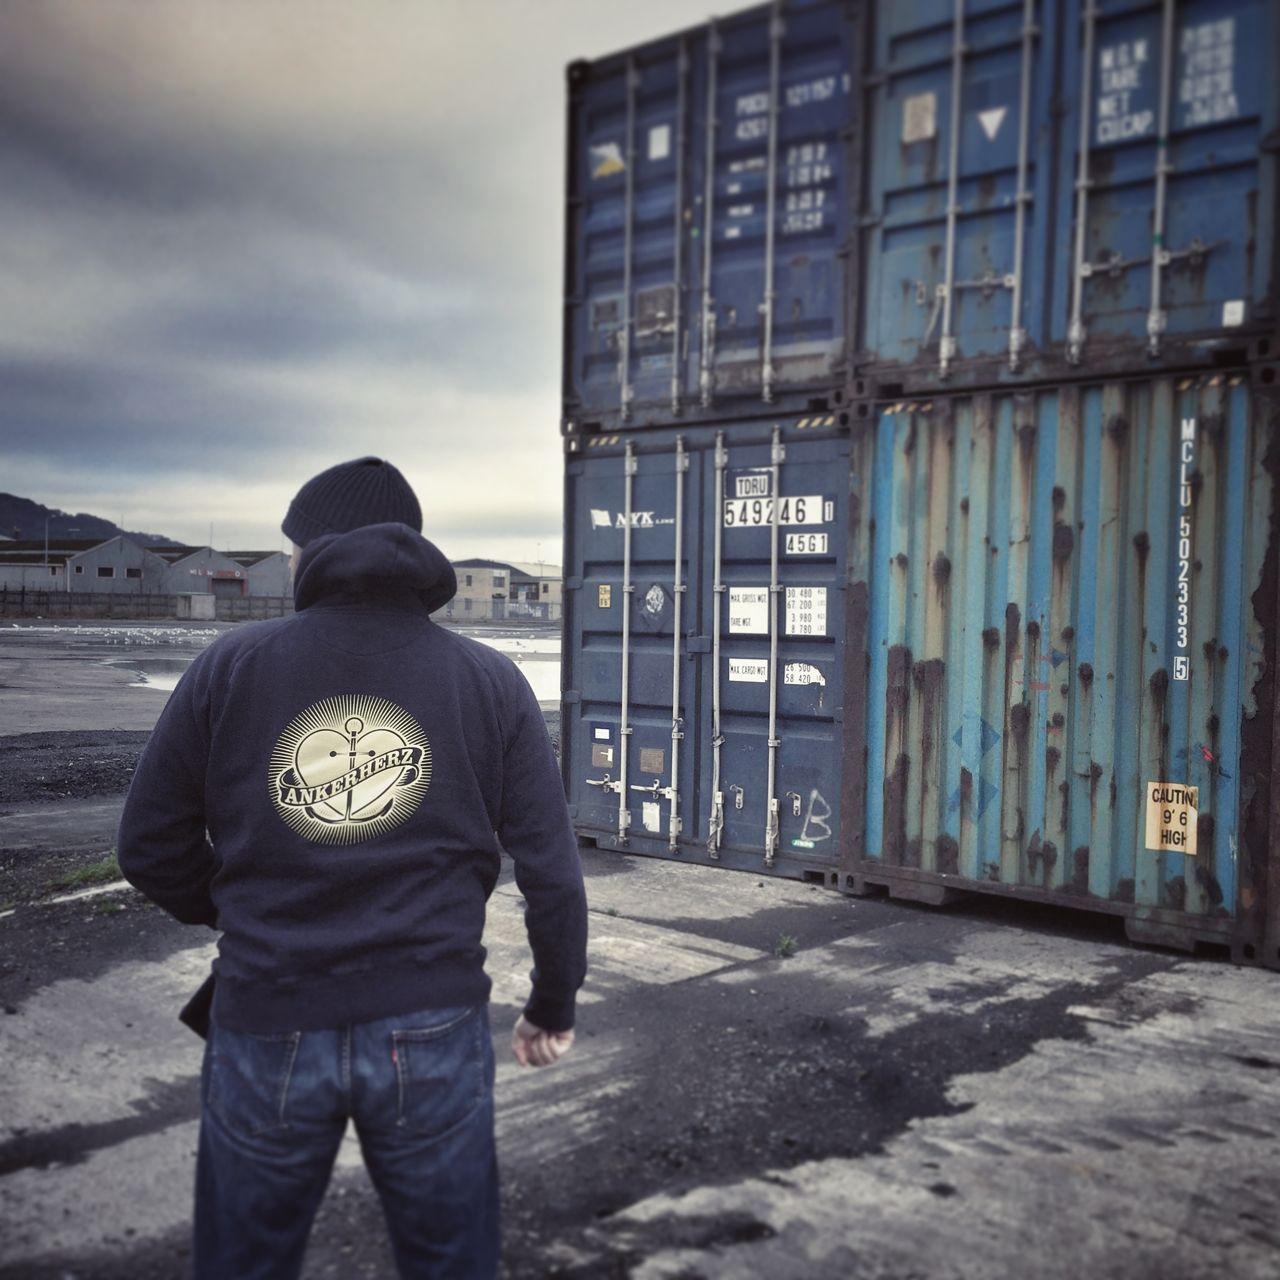 kapuzenpullover-ankerherz-docks-belfast